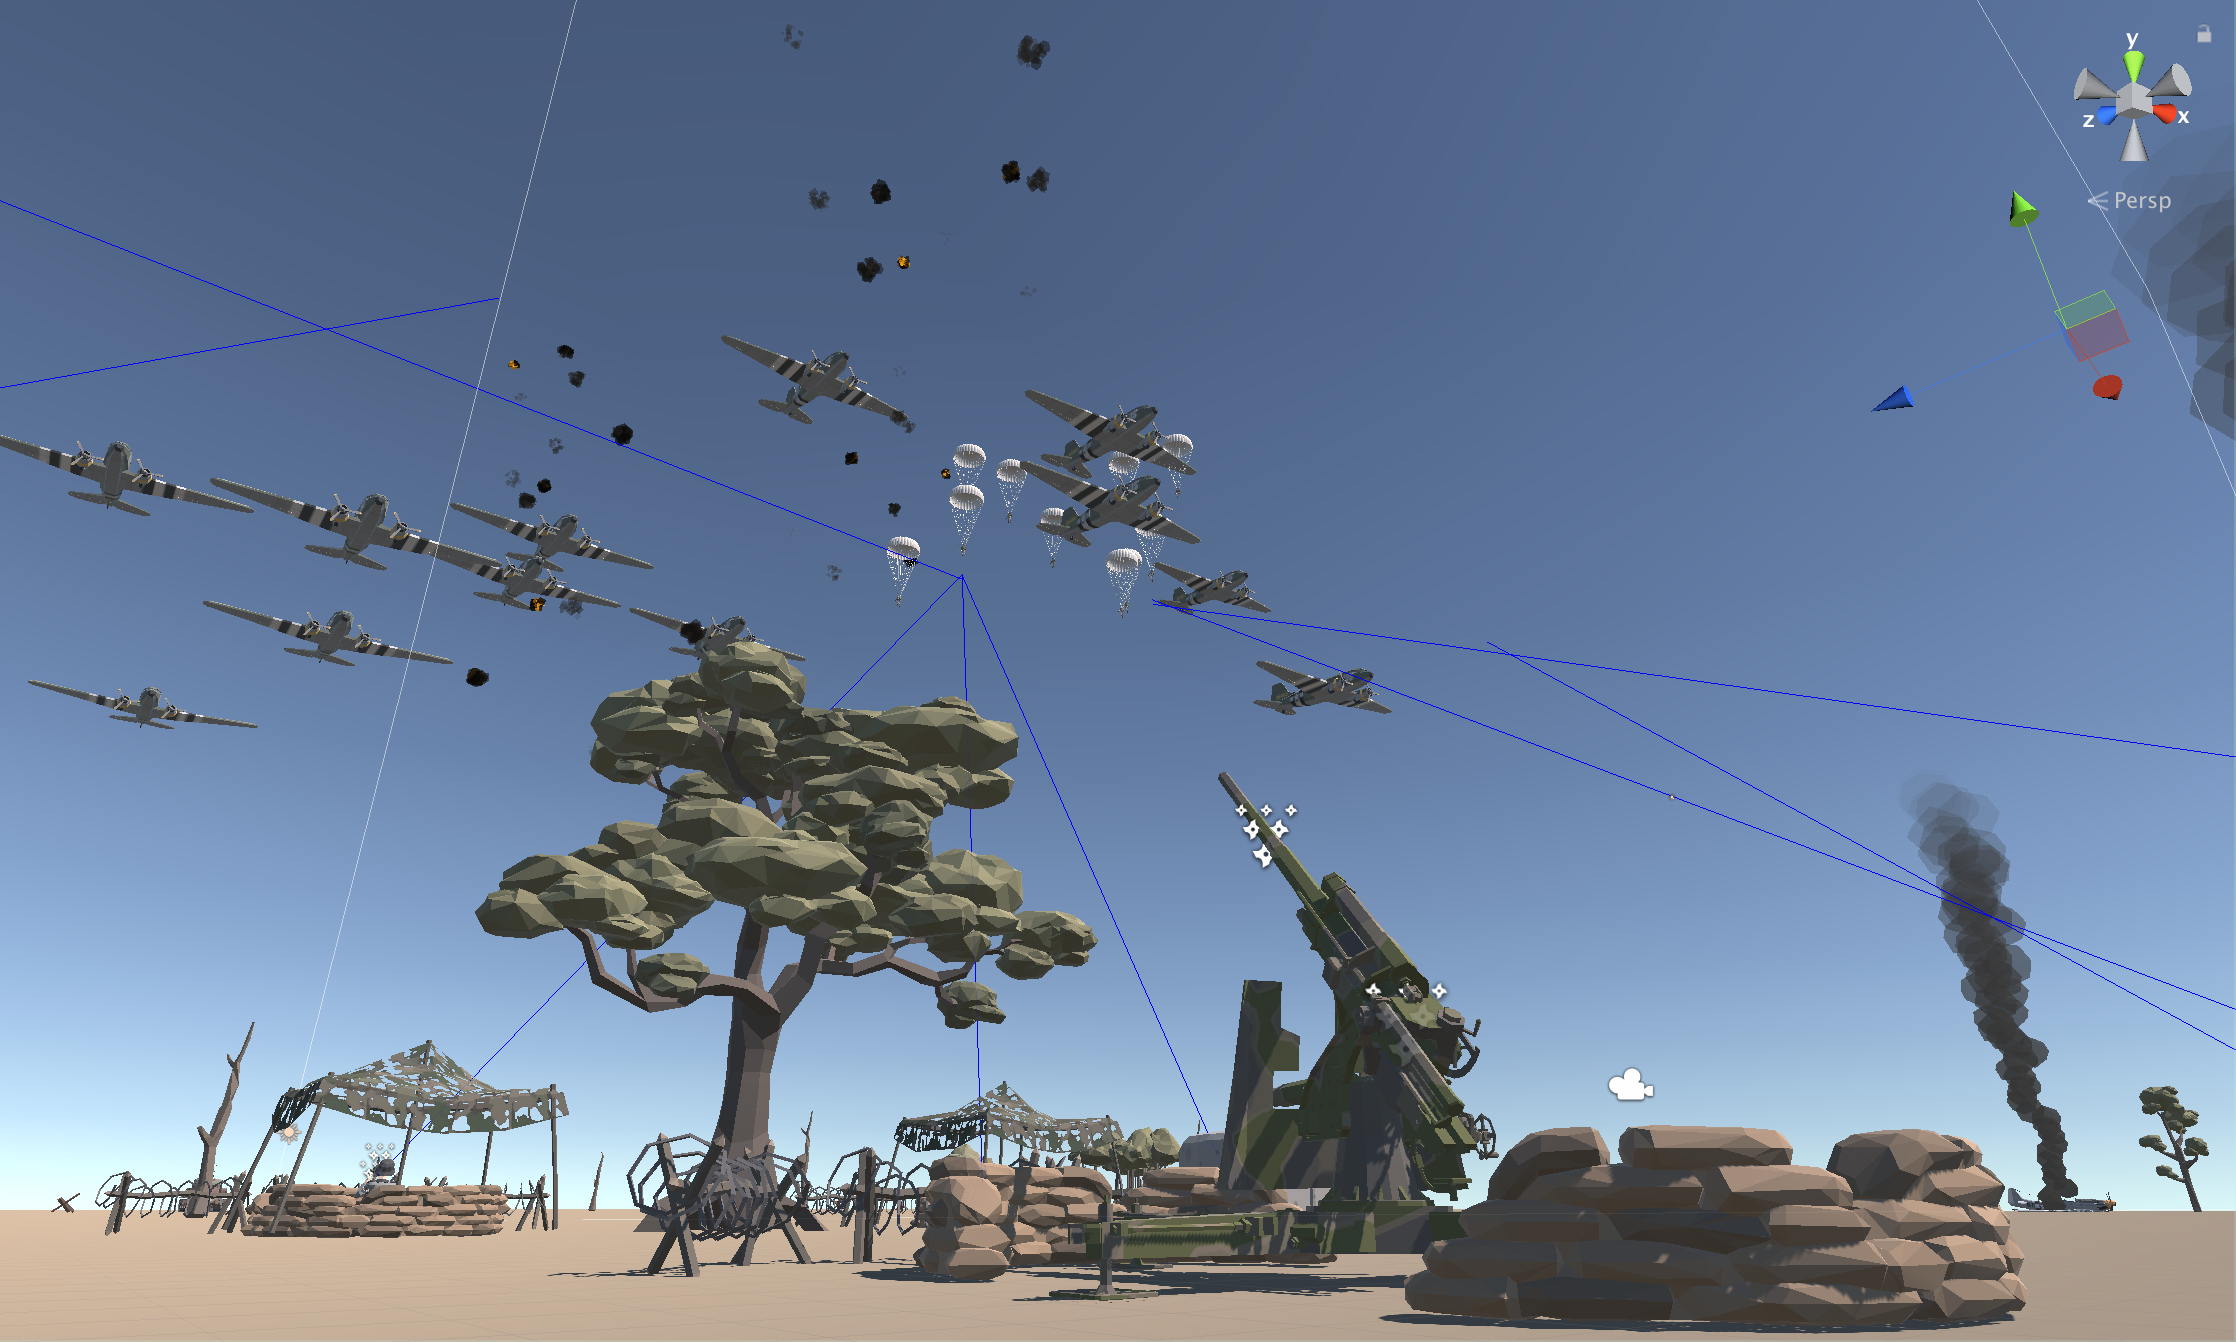 Simple intercept missile & turret behaviour  demo with Polygon War Asset